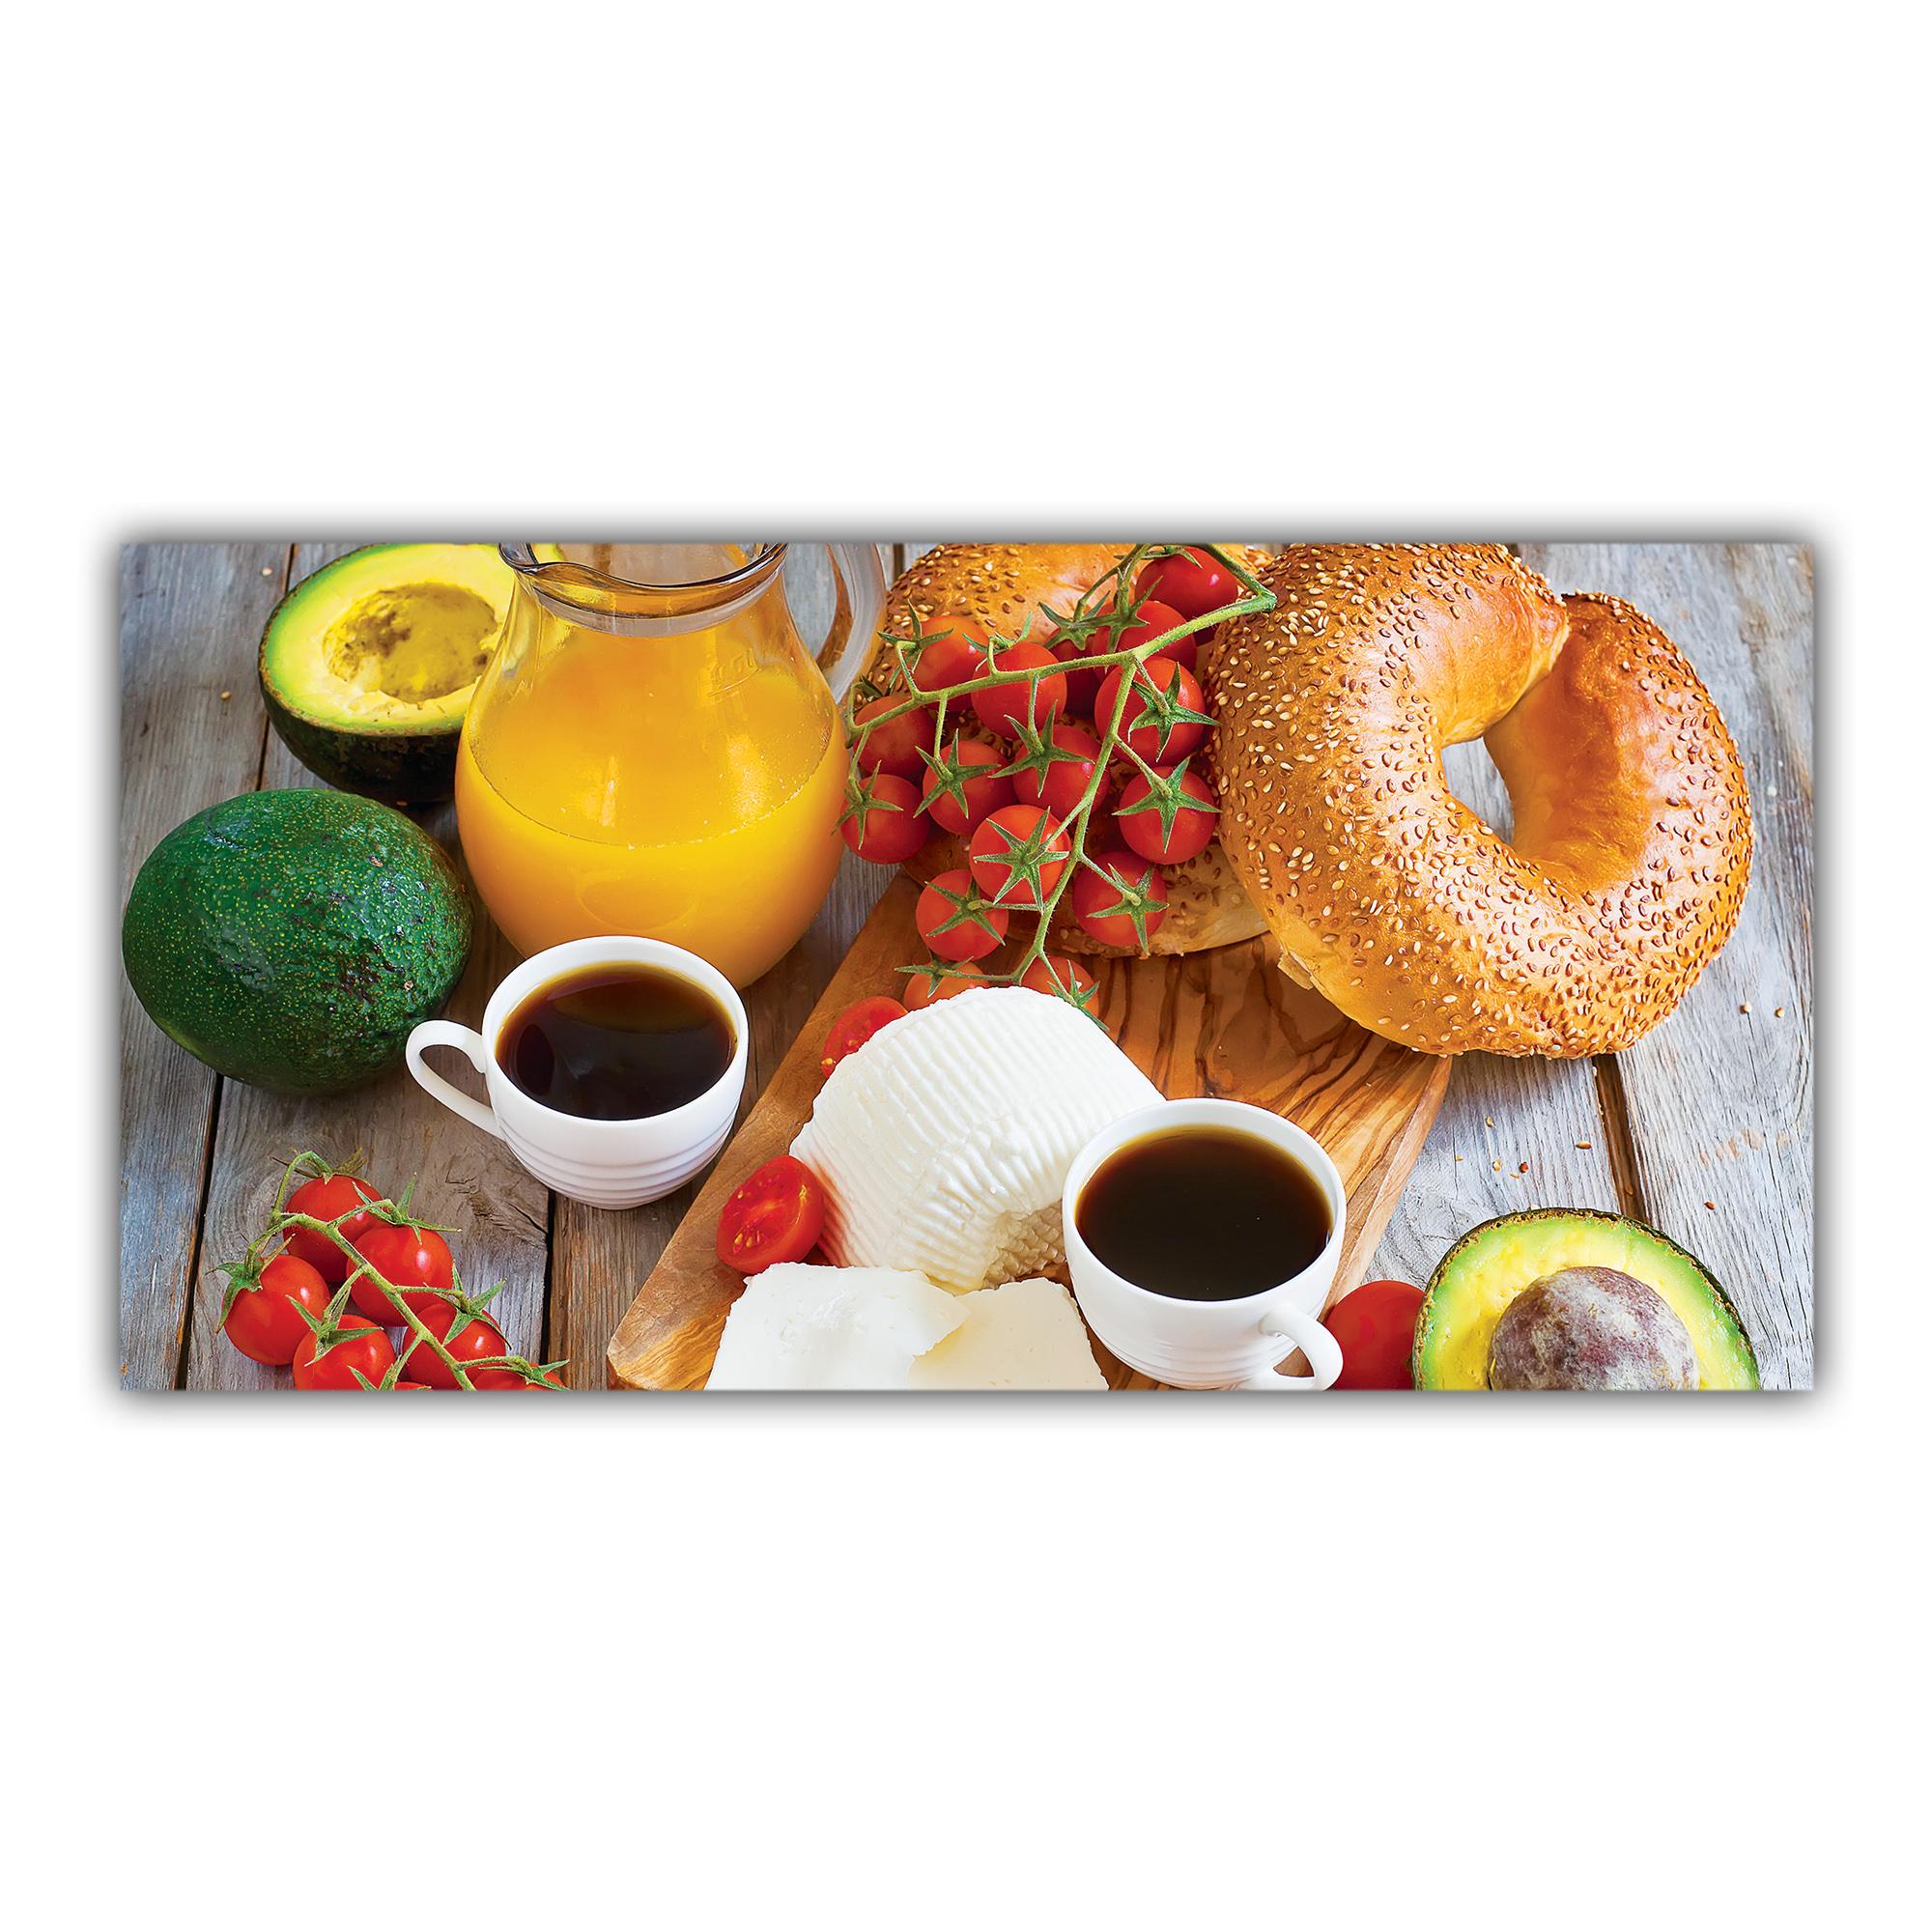 Petit Déjeuner Café Jus d'Orange